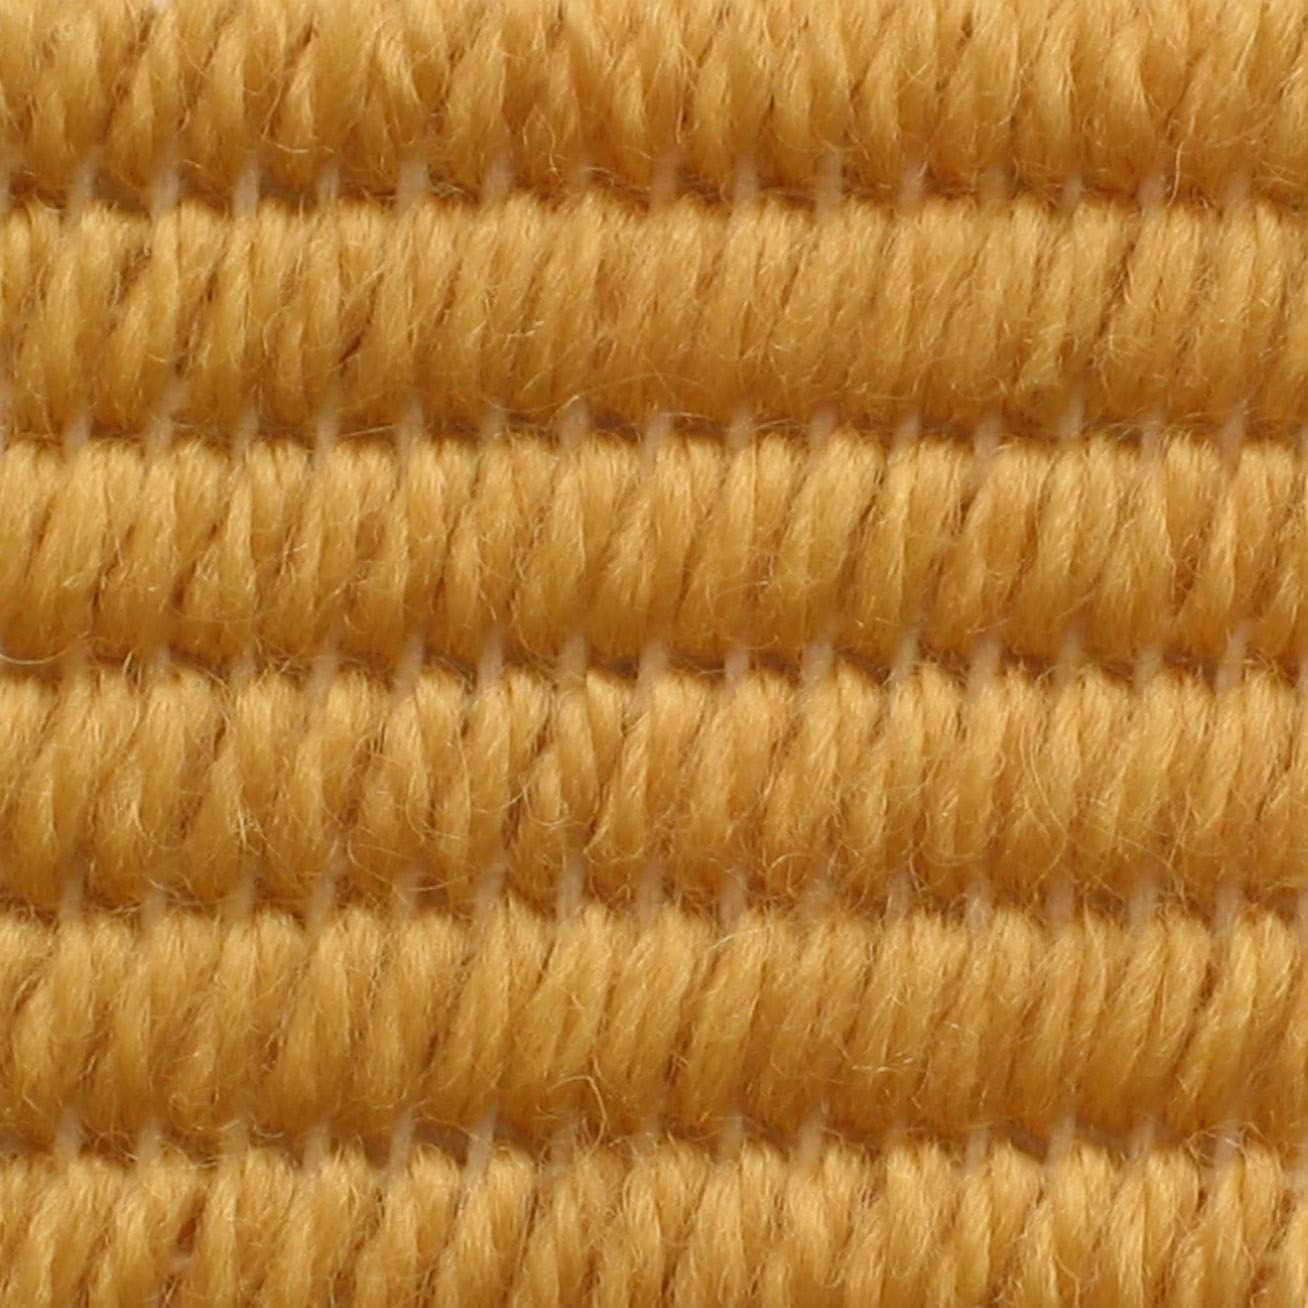 The Slanted Gobelin Stitch